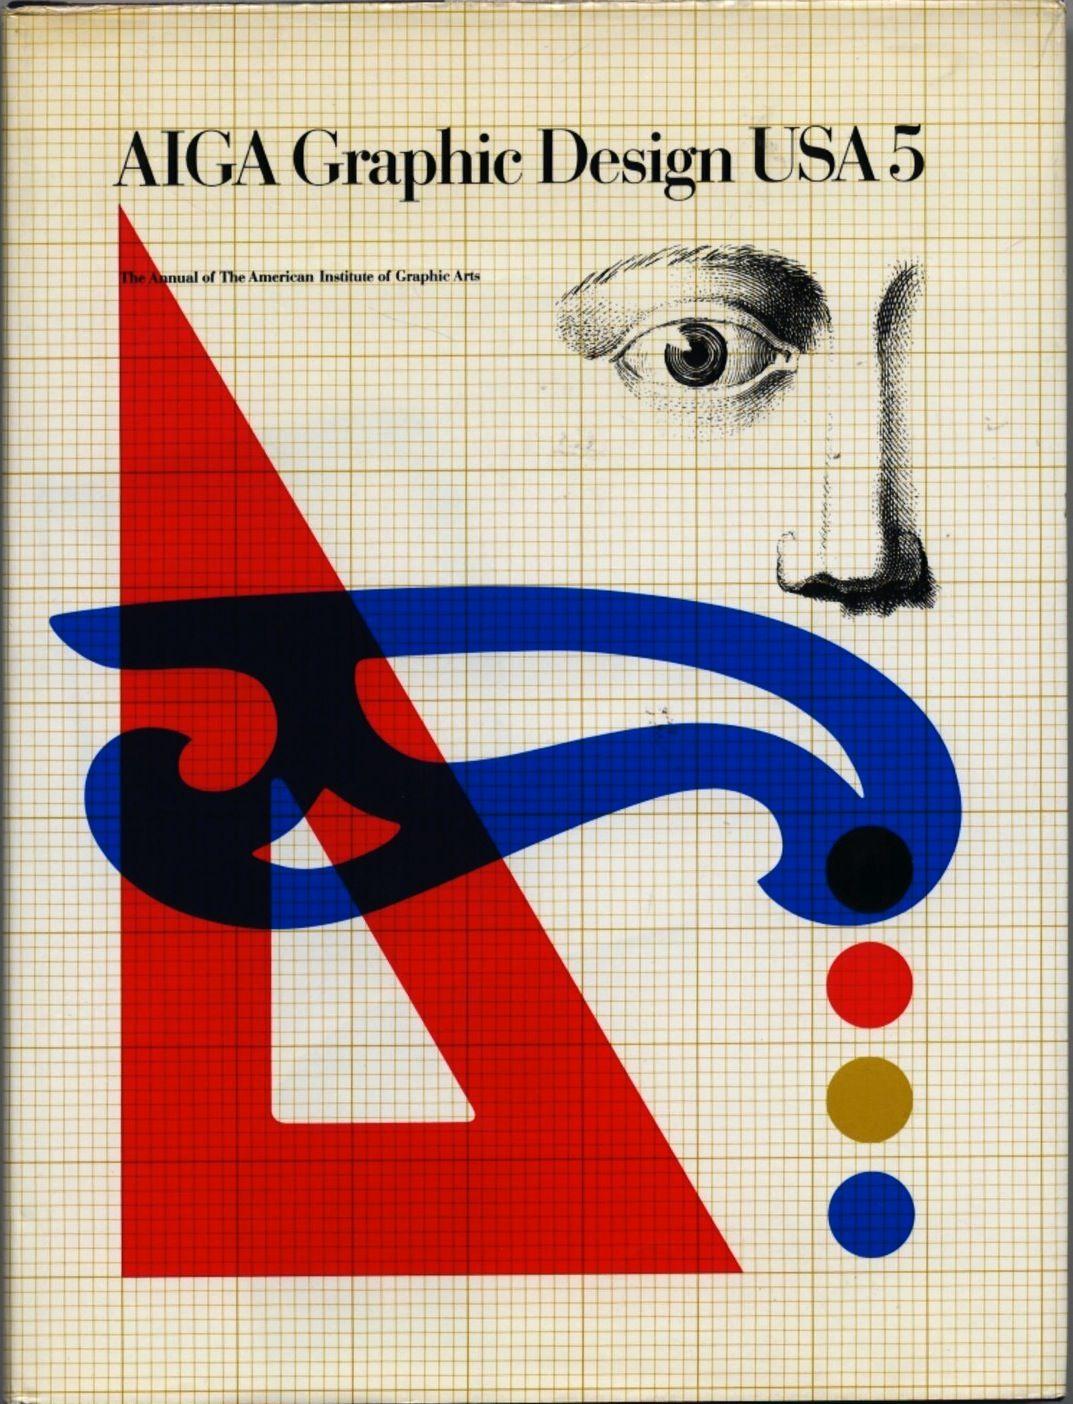 graphic design usa 7 aiga graphic design u s a